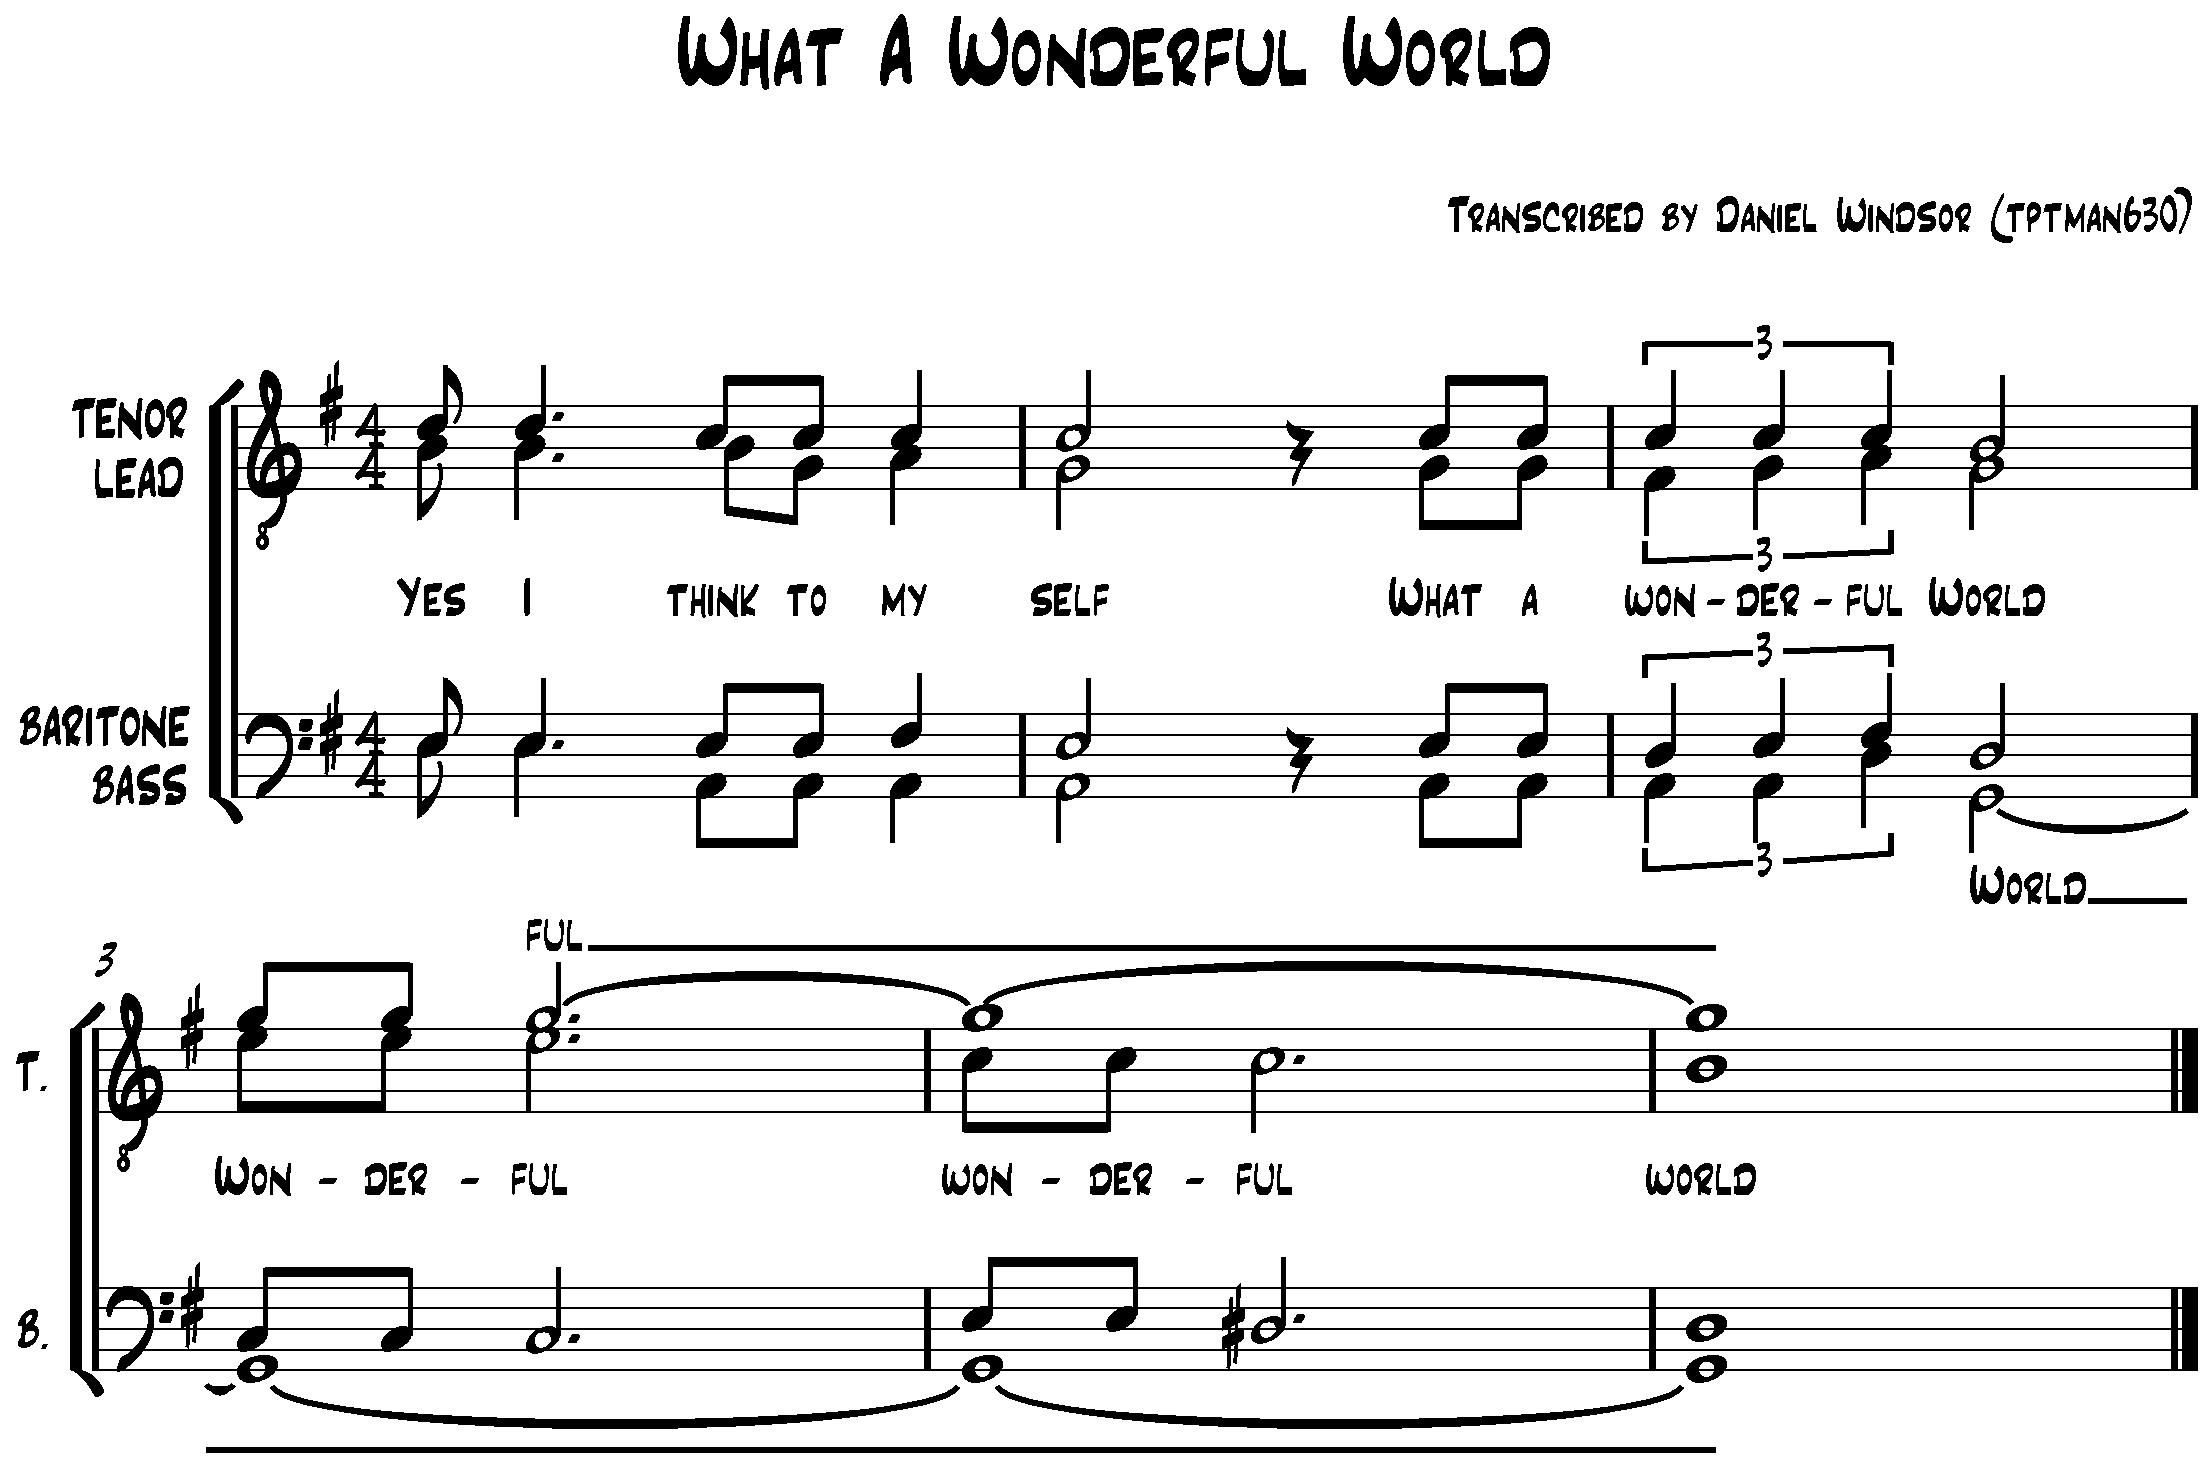 Barbershop Music : zip file containing sheet music music notation 2 files sheet music